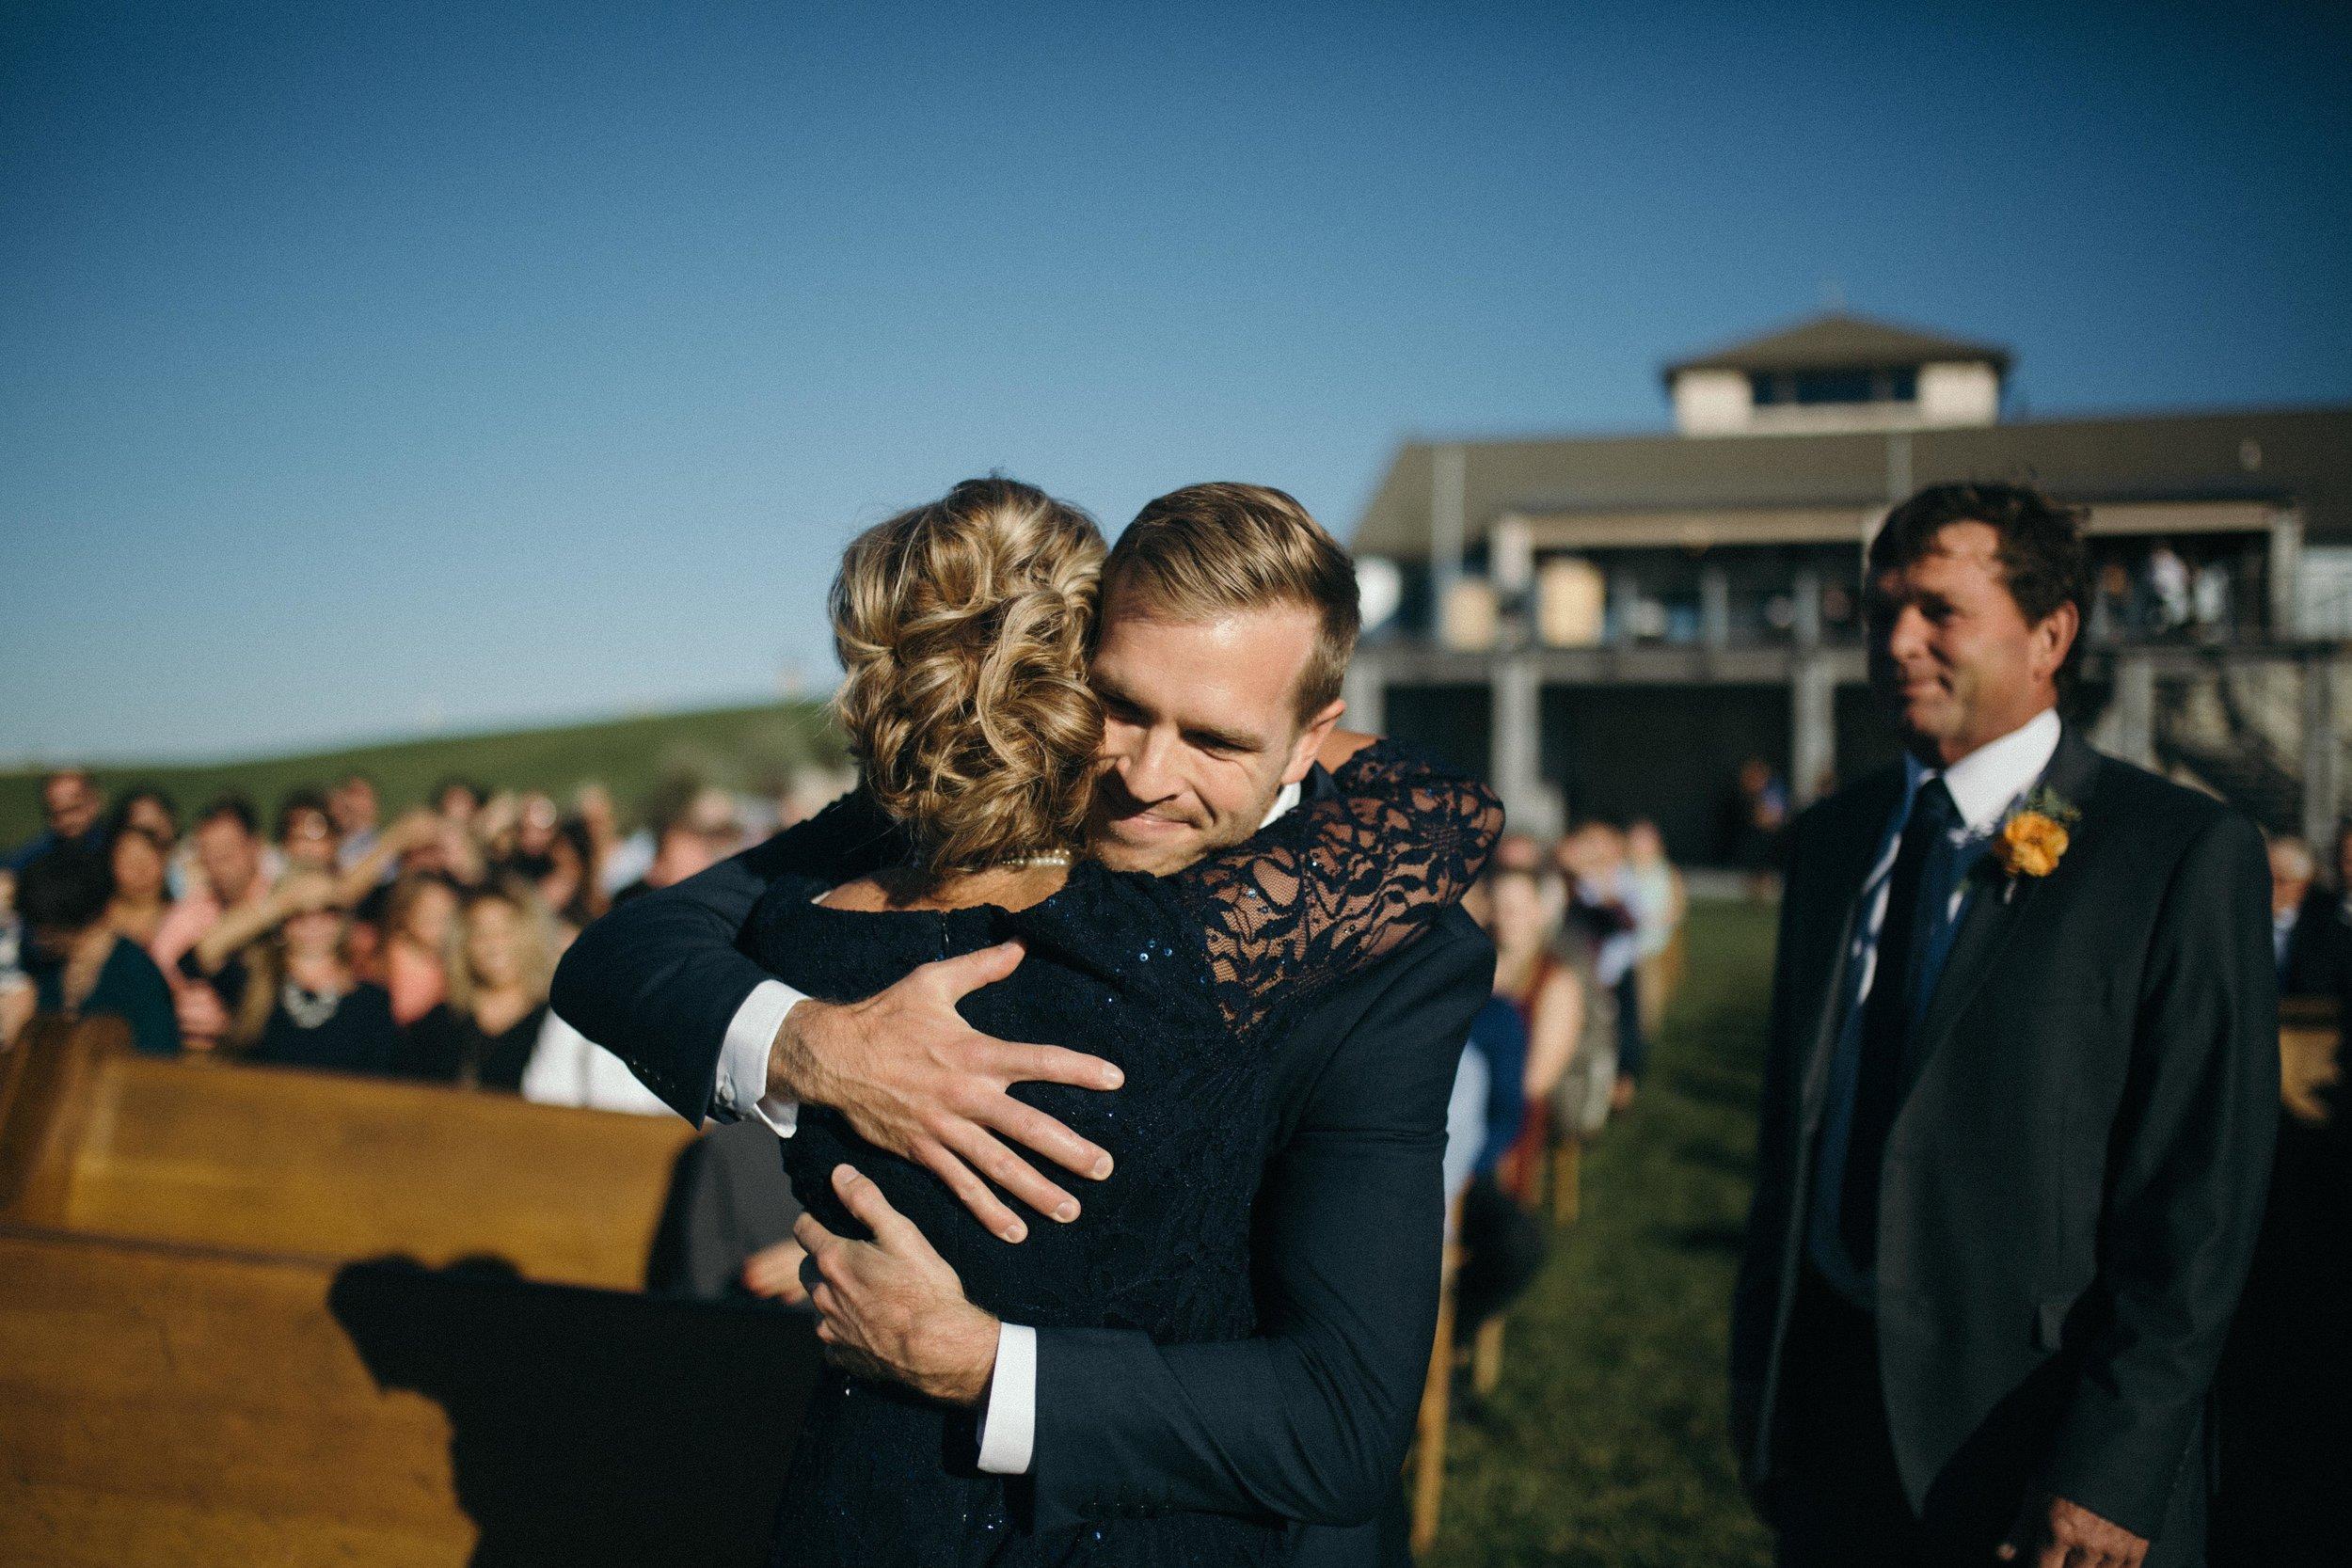 bailey-jared-wedding-blog-48.jpg